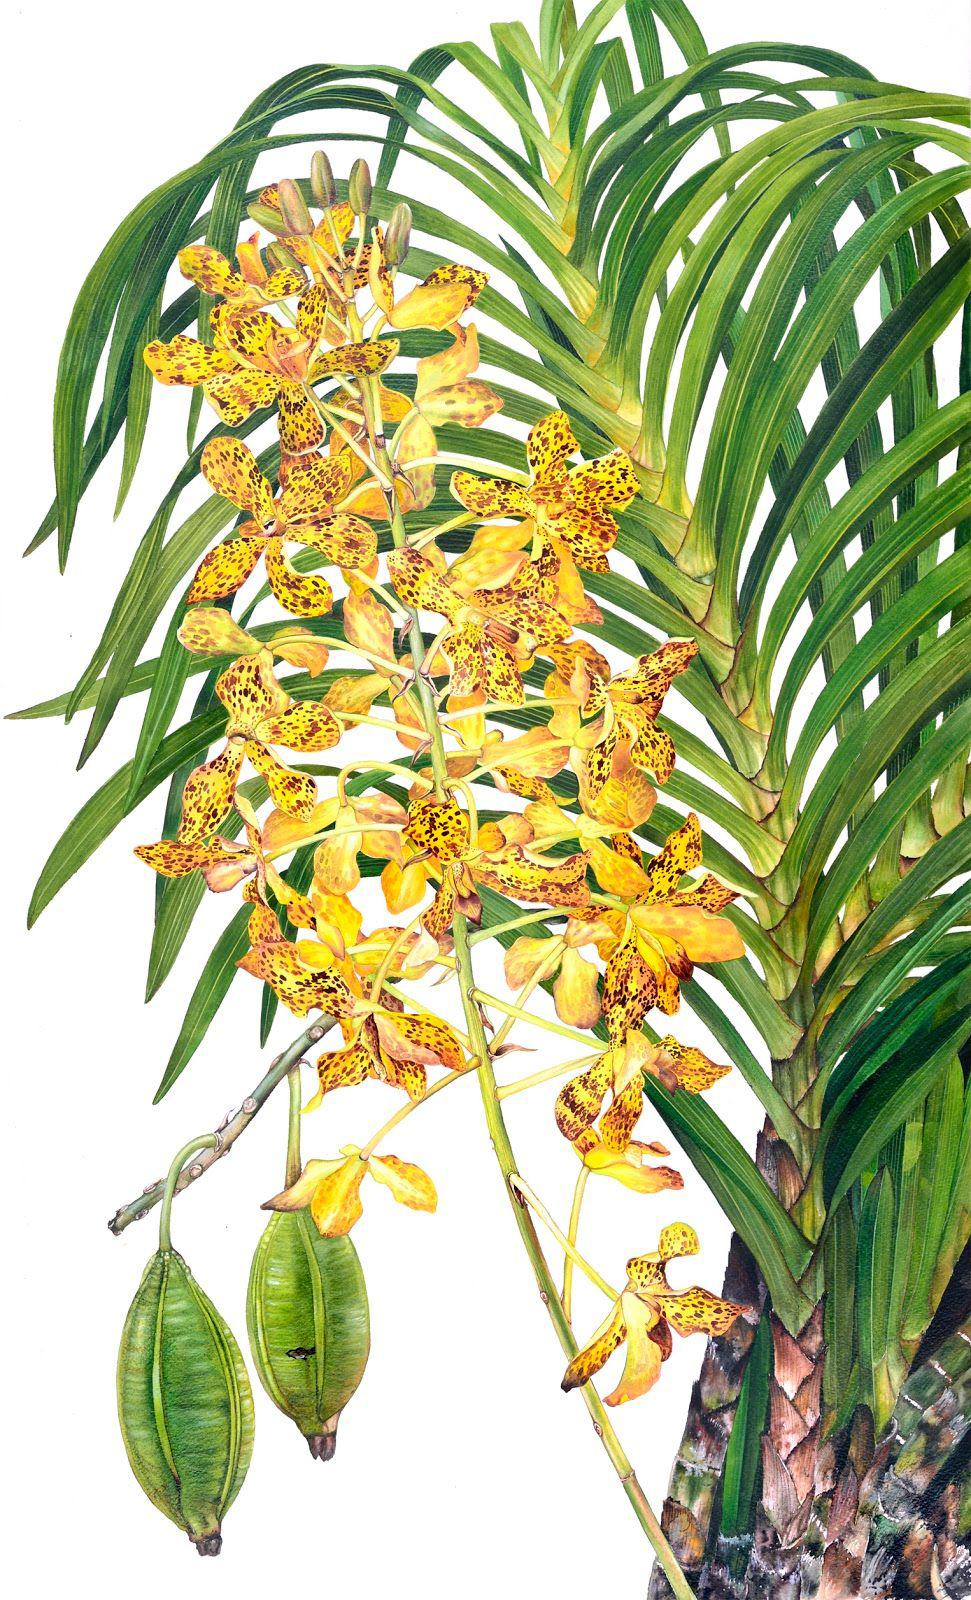 Grammatophyllum speciosum,  watercolor on paper, ©Karyono Apic 2015